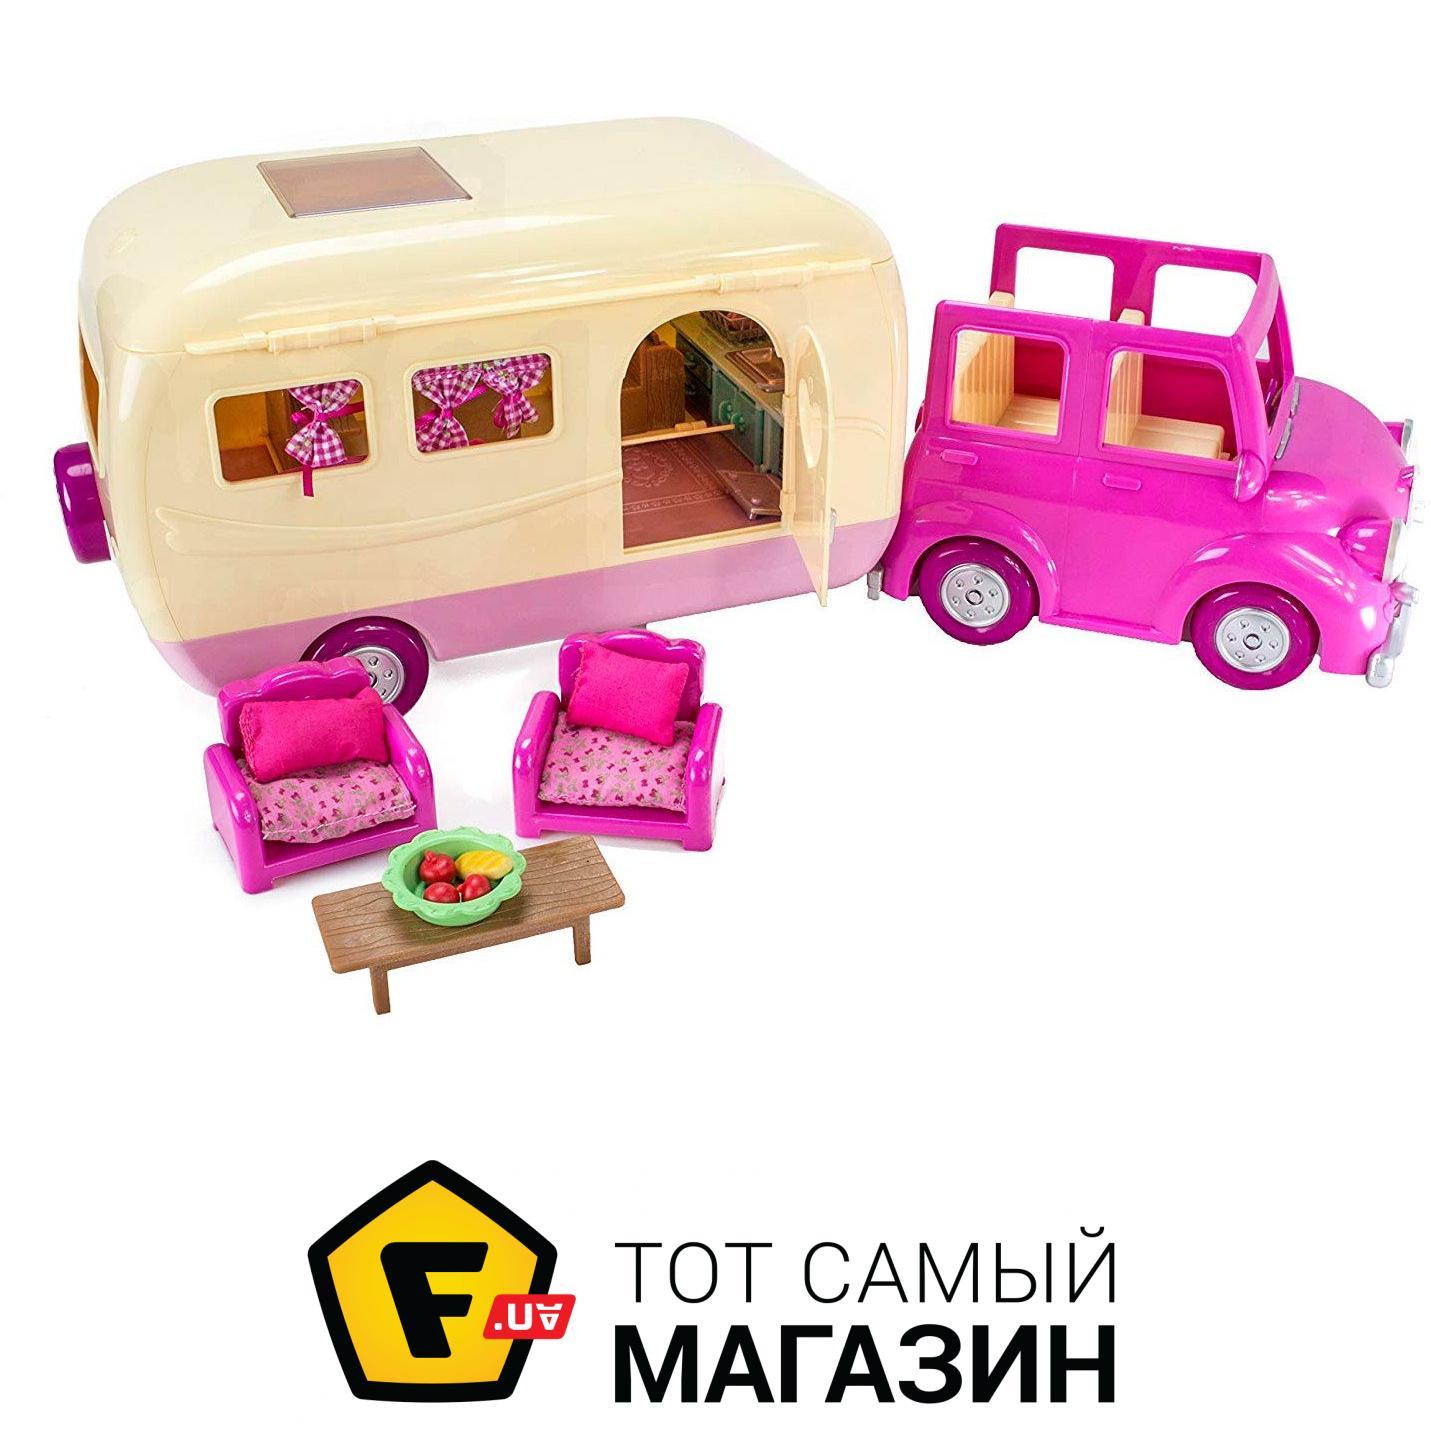 картинки игрушки домика на колесах в магазине центр парке обоев морские свинки